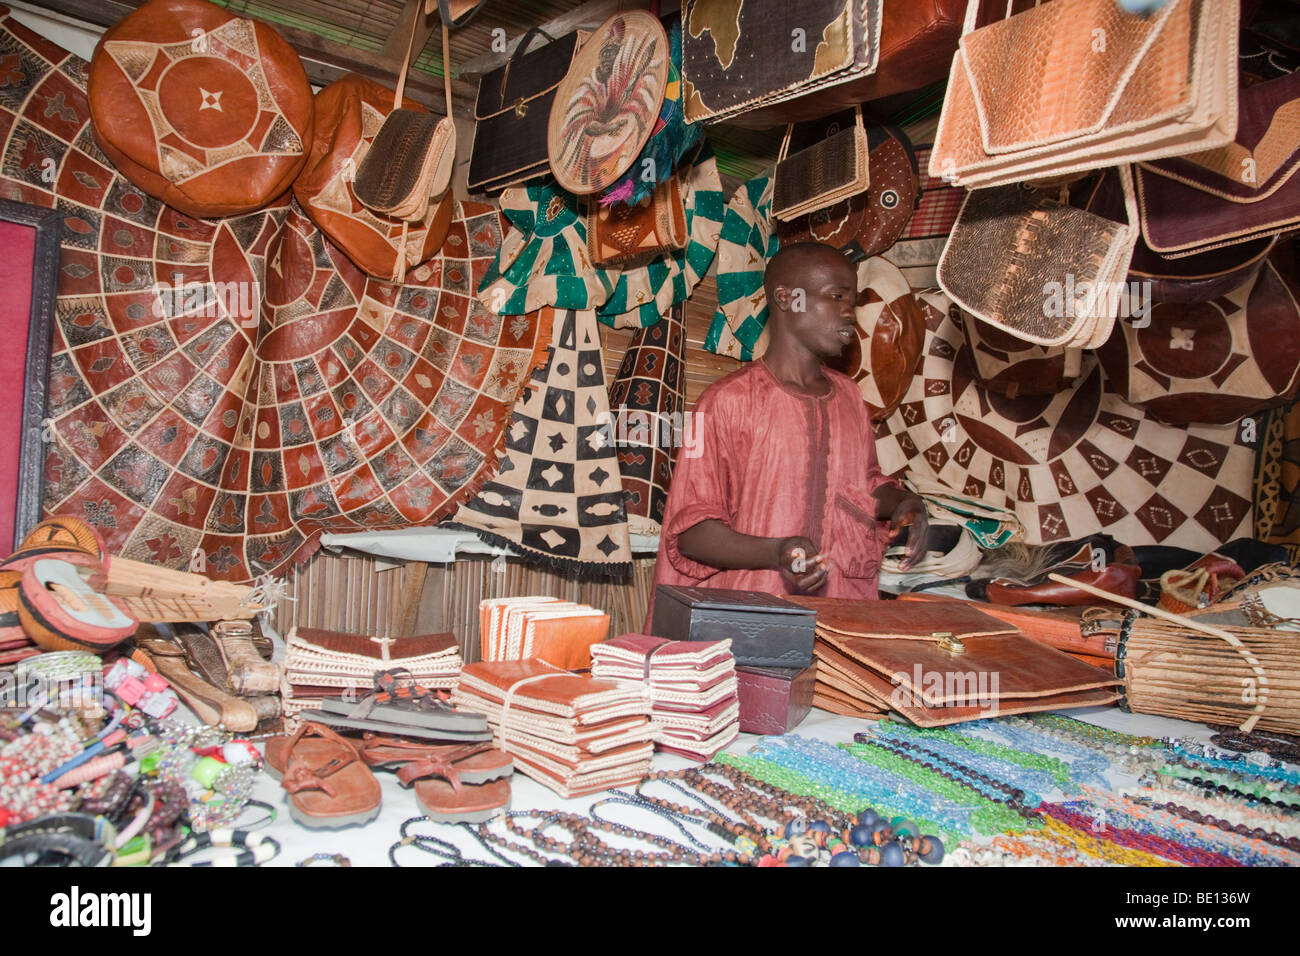 A man sells leather handicrafts inNigeria's capital city of Abuja. - Stock Image